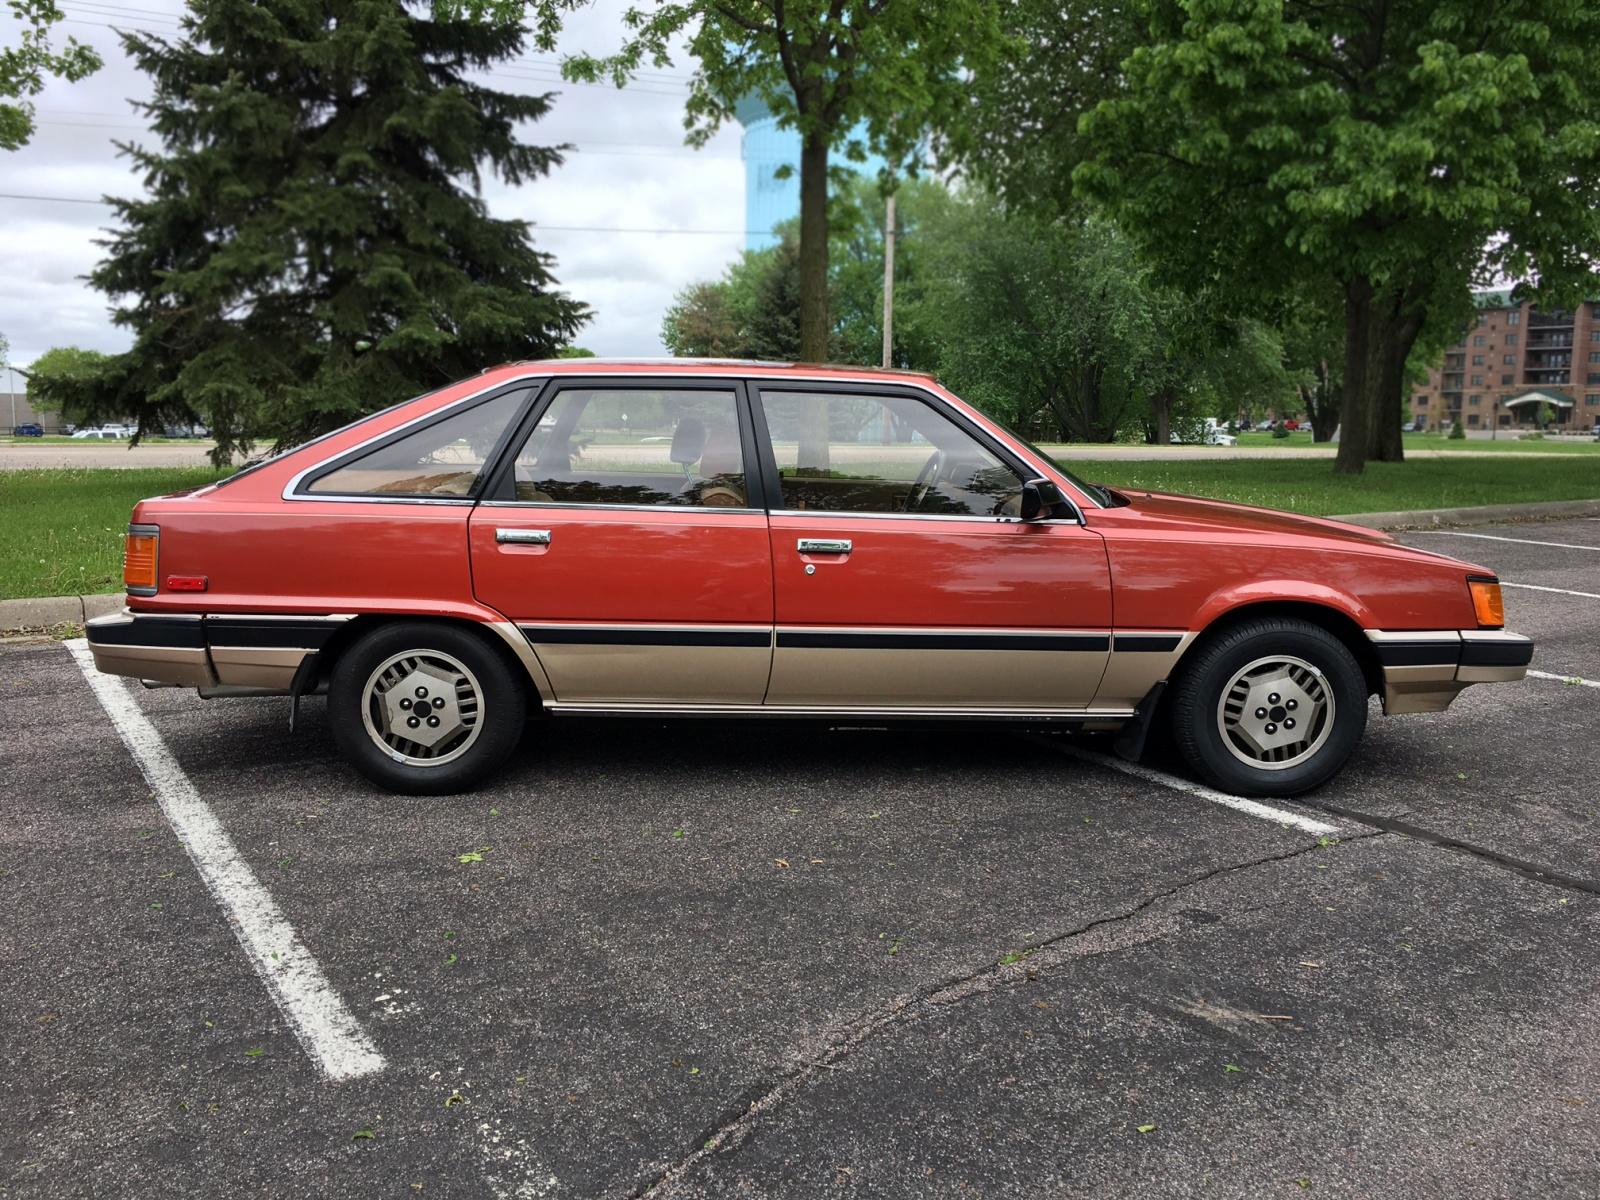 Scotty G's Garage: 1984 Toyota Camry Liftback